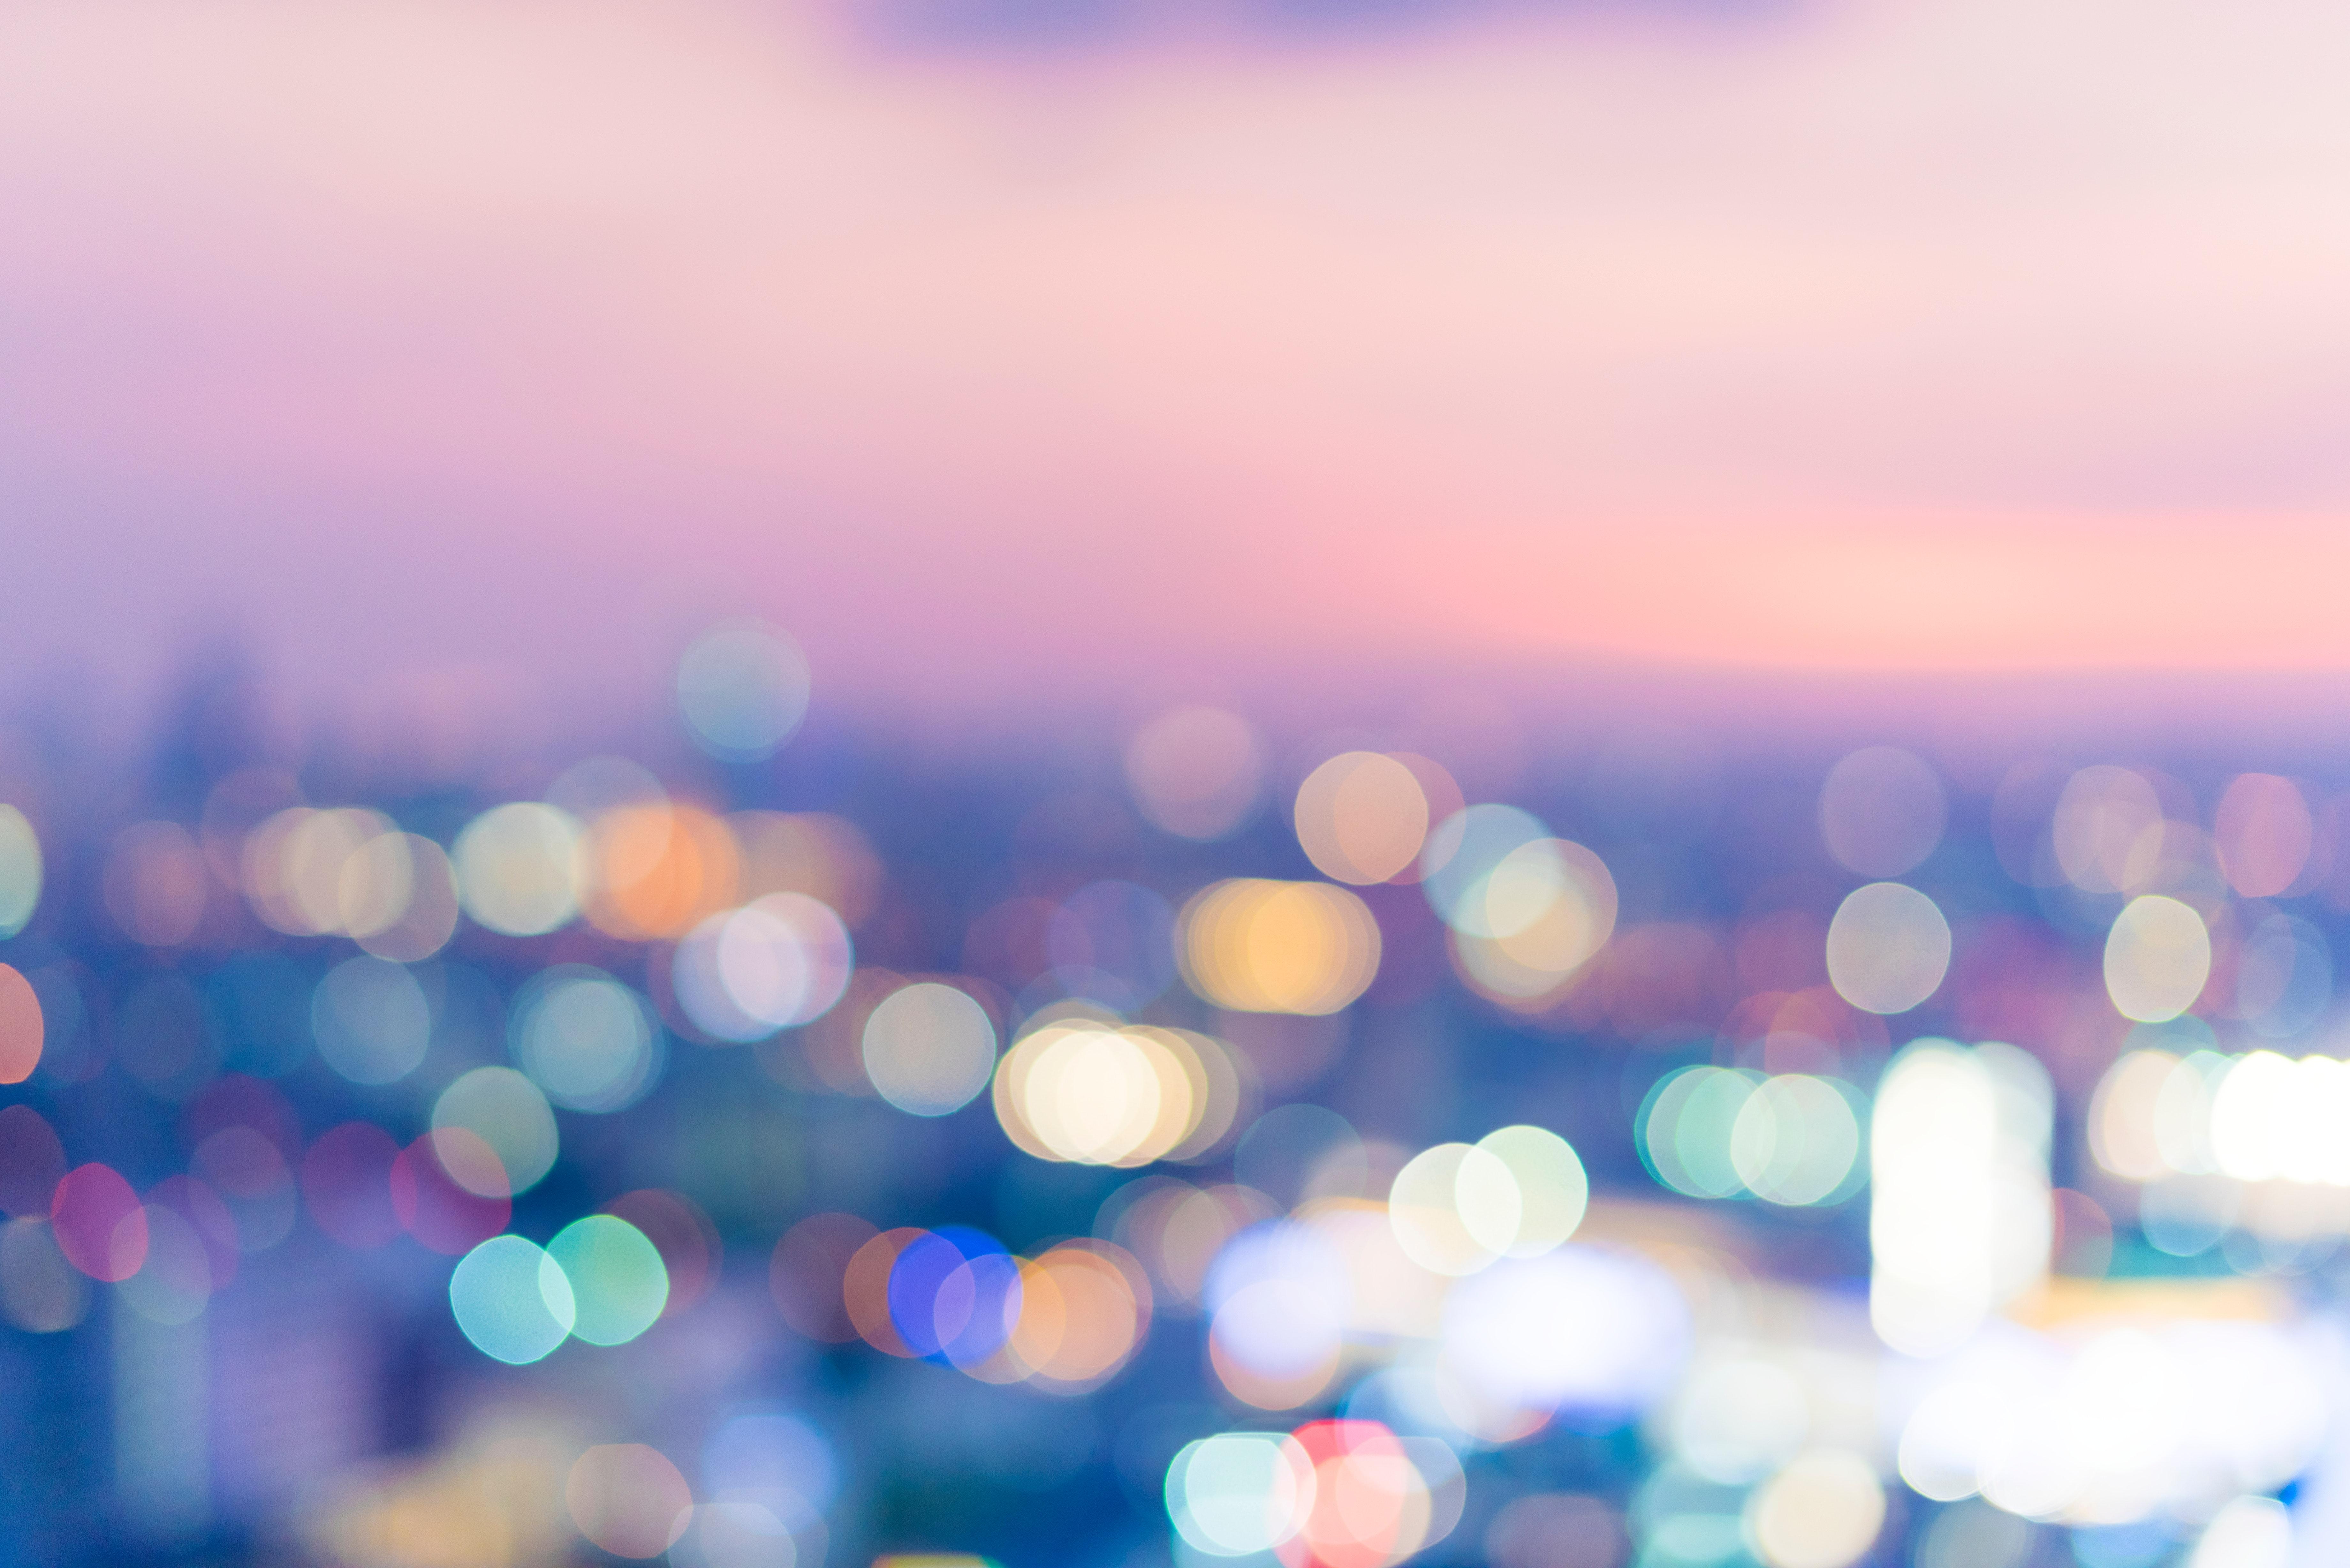 Bokeh Photography Effect, Blur, Blurred, Bokeh, Colorful, HQ Photo